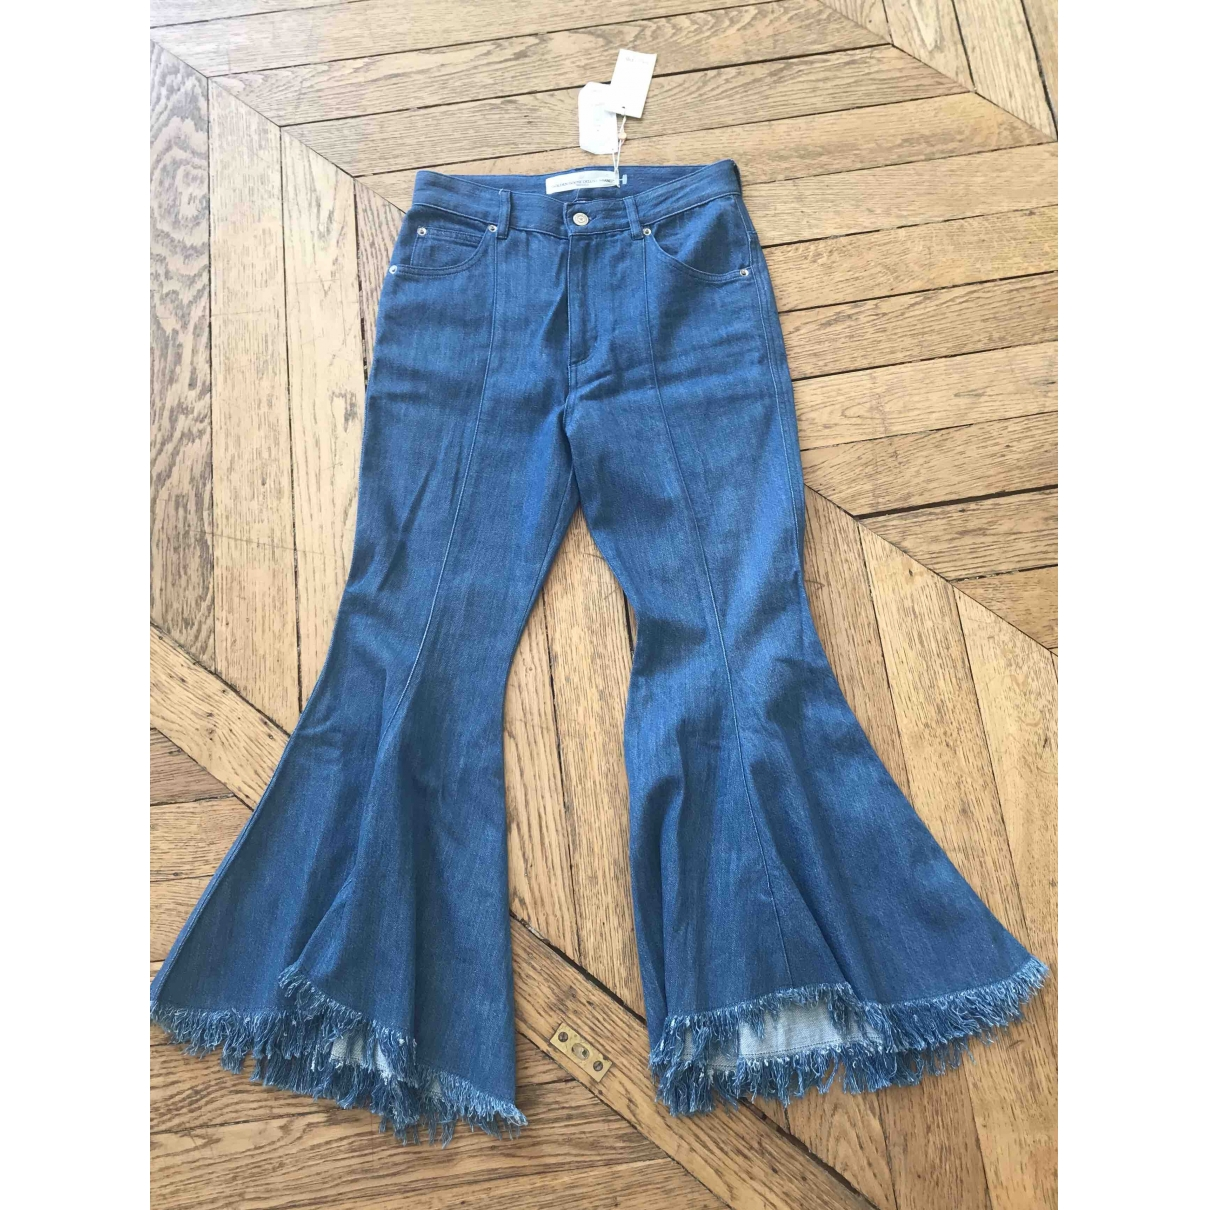 Golden Goose \N Blue Denim - Jeans Jeans for Women 26 US